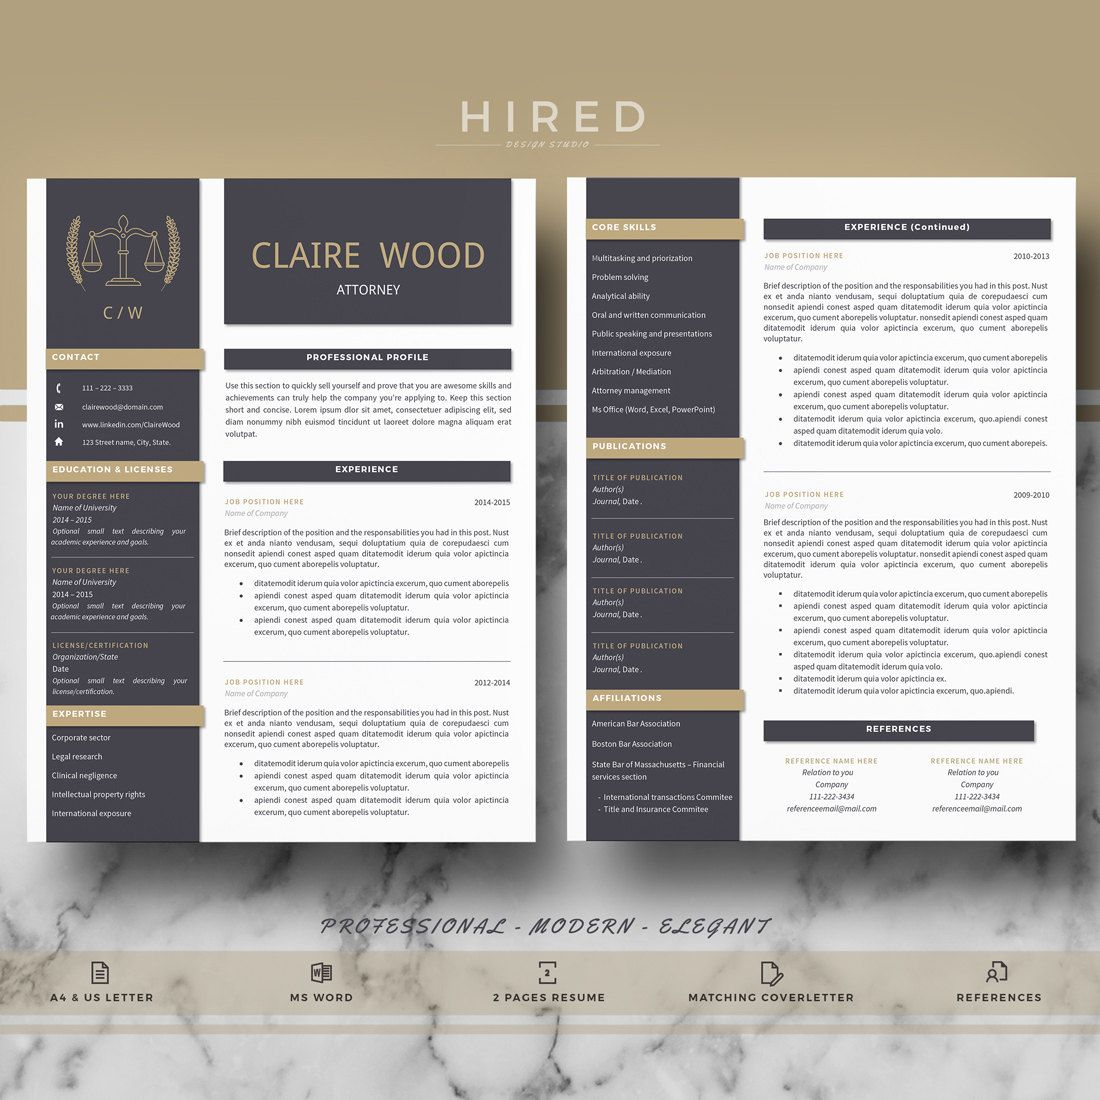 Attorney Resume Template Lawyer Resume Legal Resume Cv Resume Cover Letter References Professional Resume Cv Instant Download Plantilla De Curriculum Hoja De Vida Plantillas Curriculum